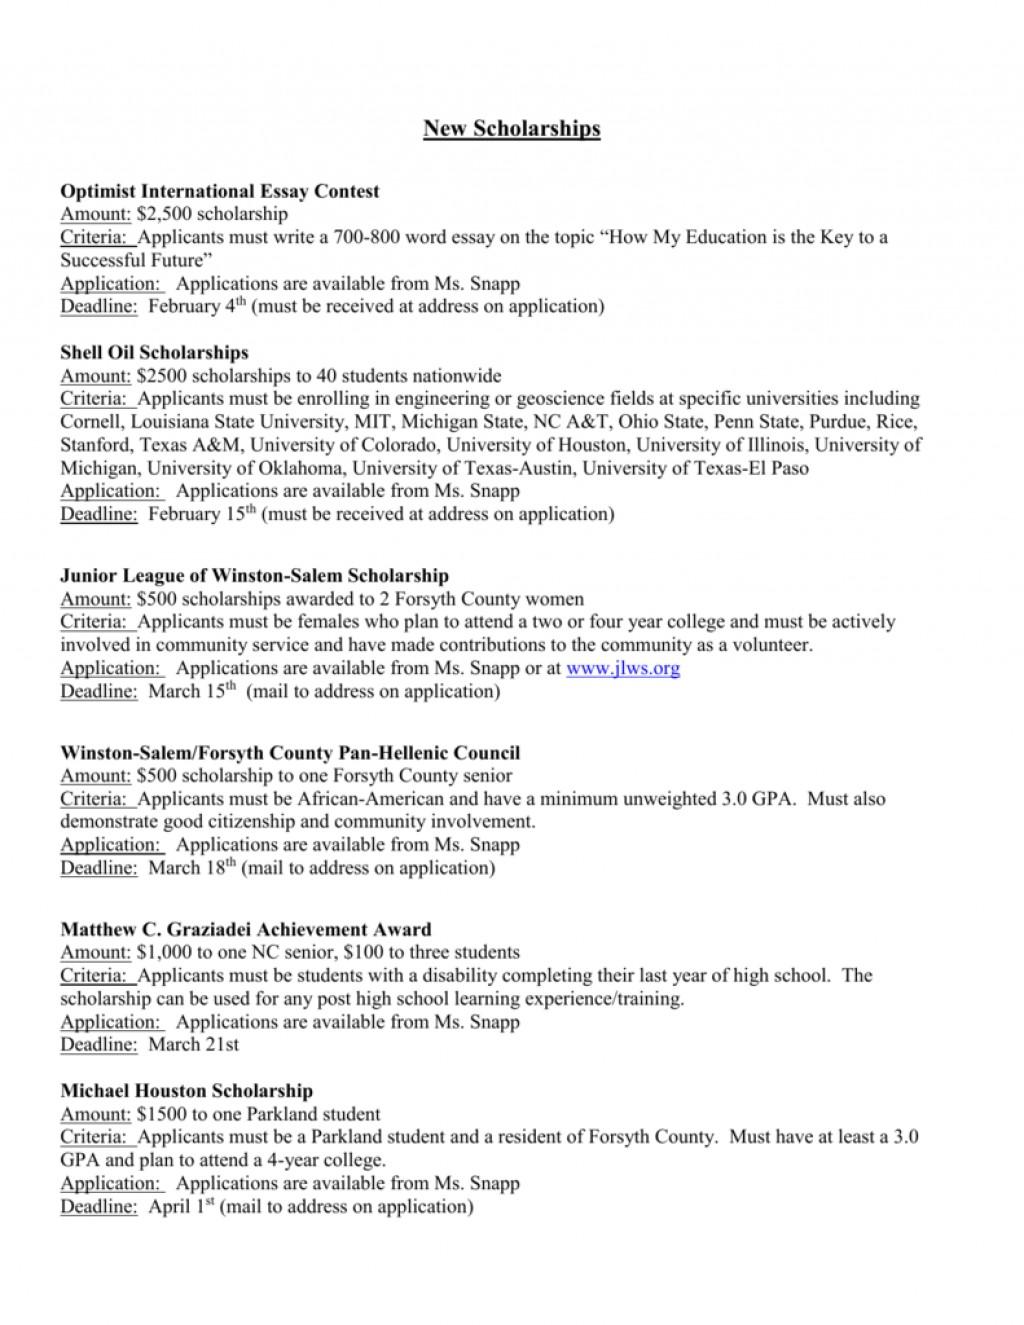 001 Essay Example Immigration Scholarship Contest 007246491 1 Fantastic Usattorneys.com Us Attorneys Large